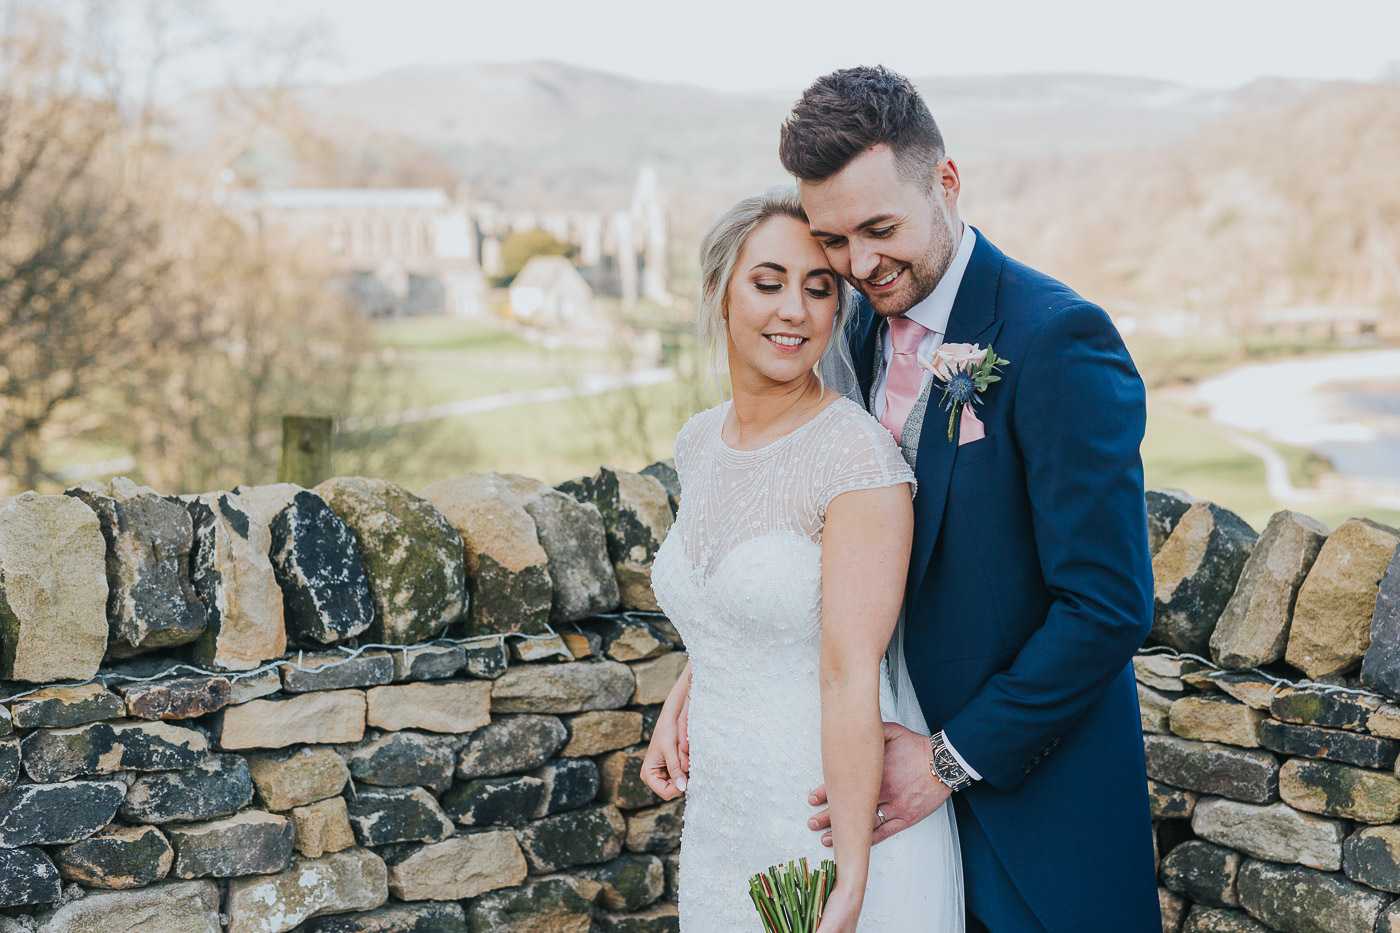 Tithe Barn - Laura Calderwood Photography - 29.3.19 - Mr & Mrs Lancaster290319-120.jpg